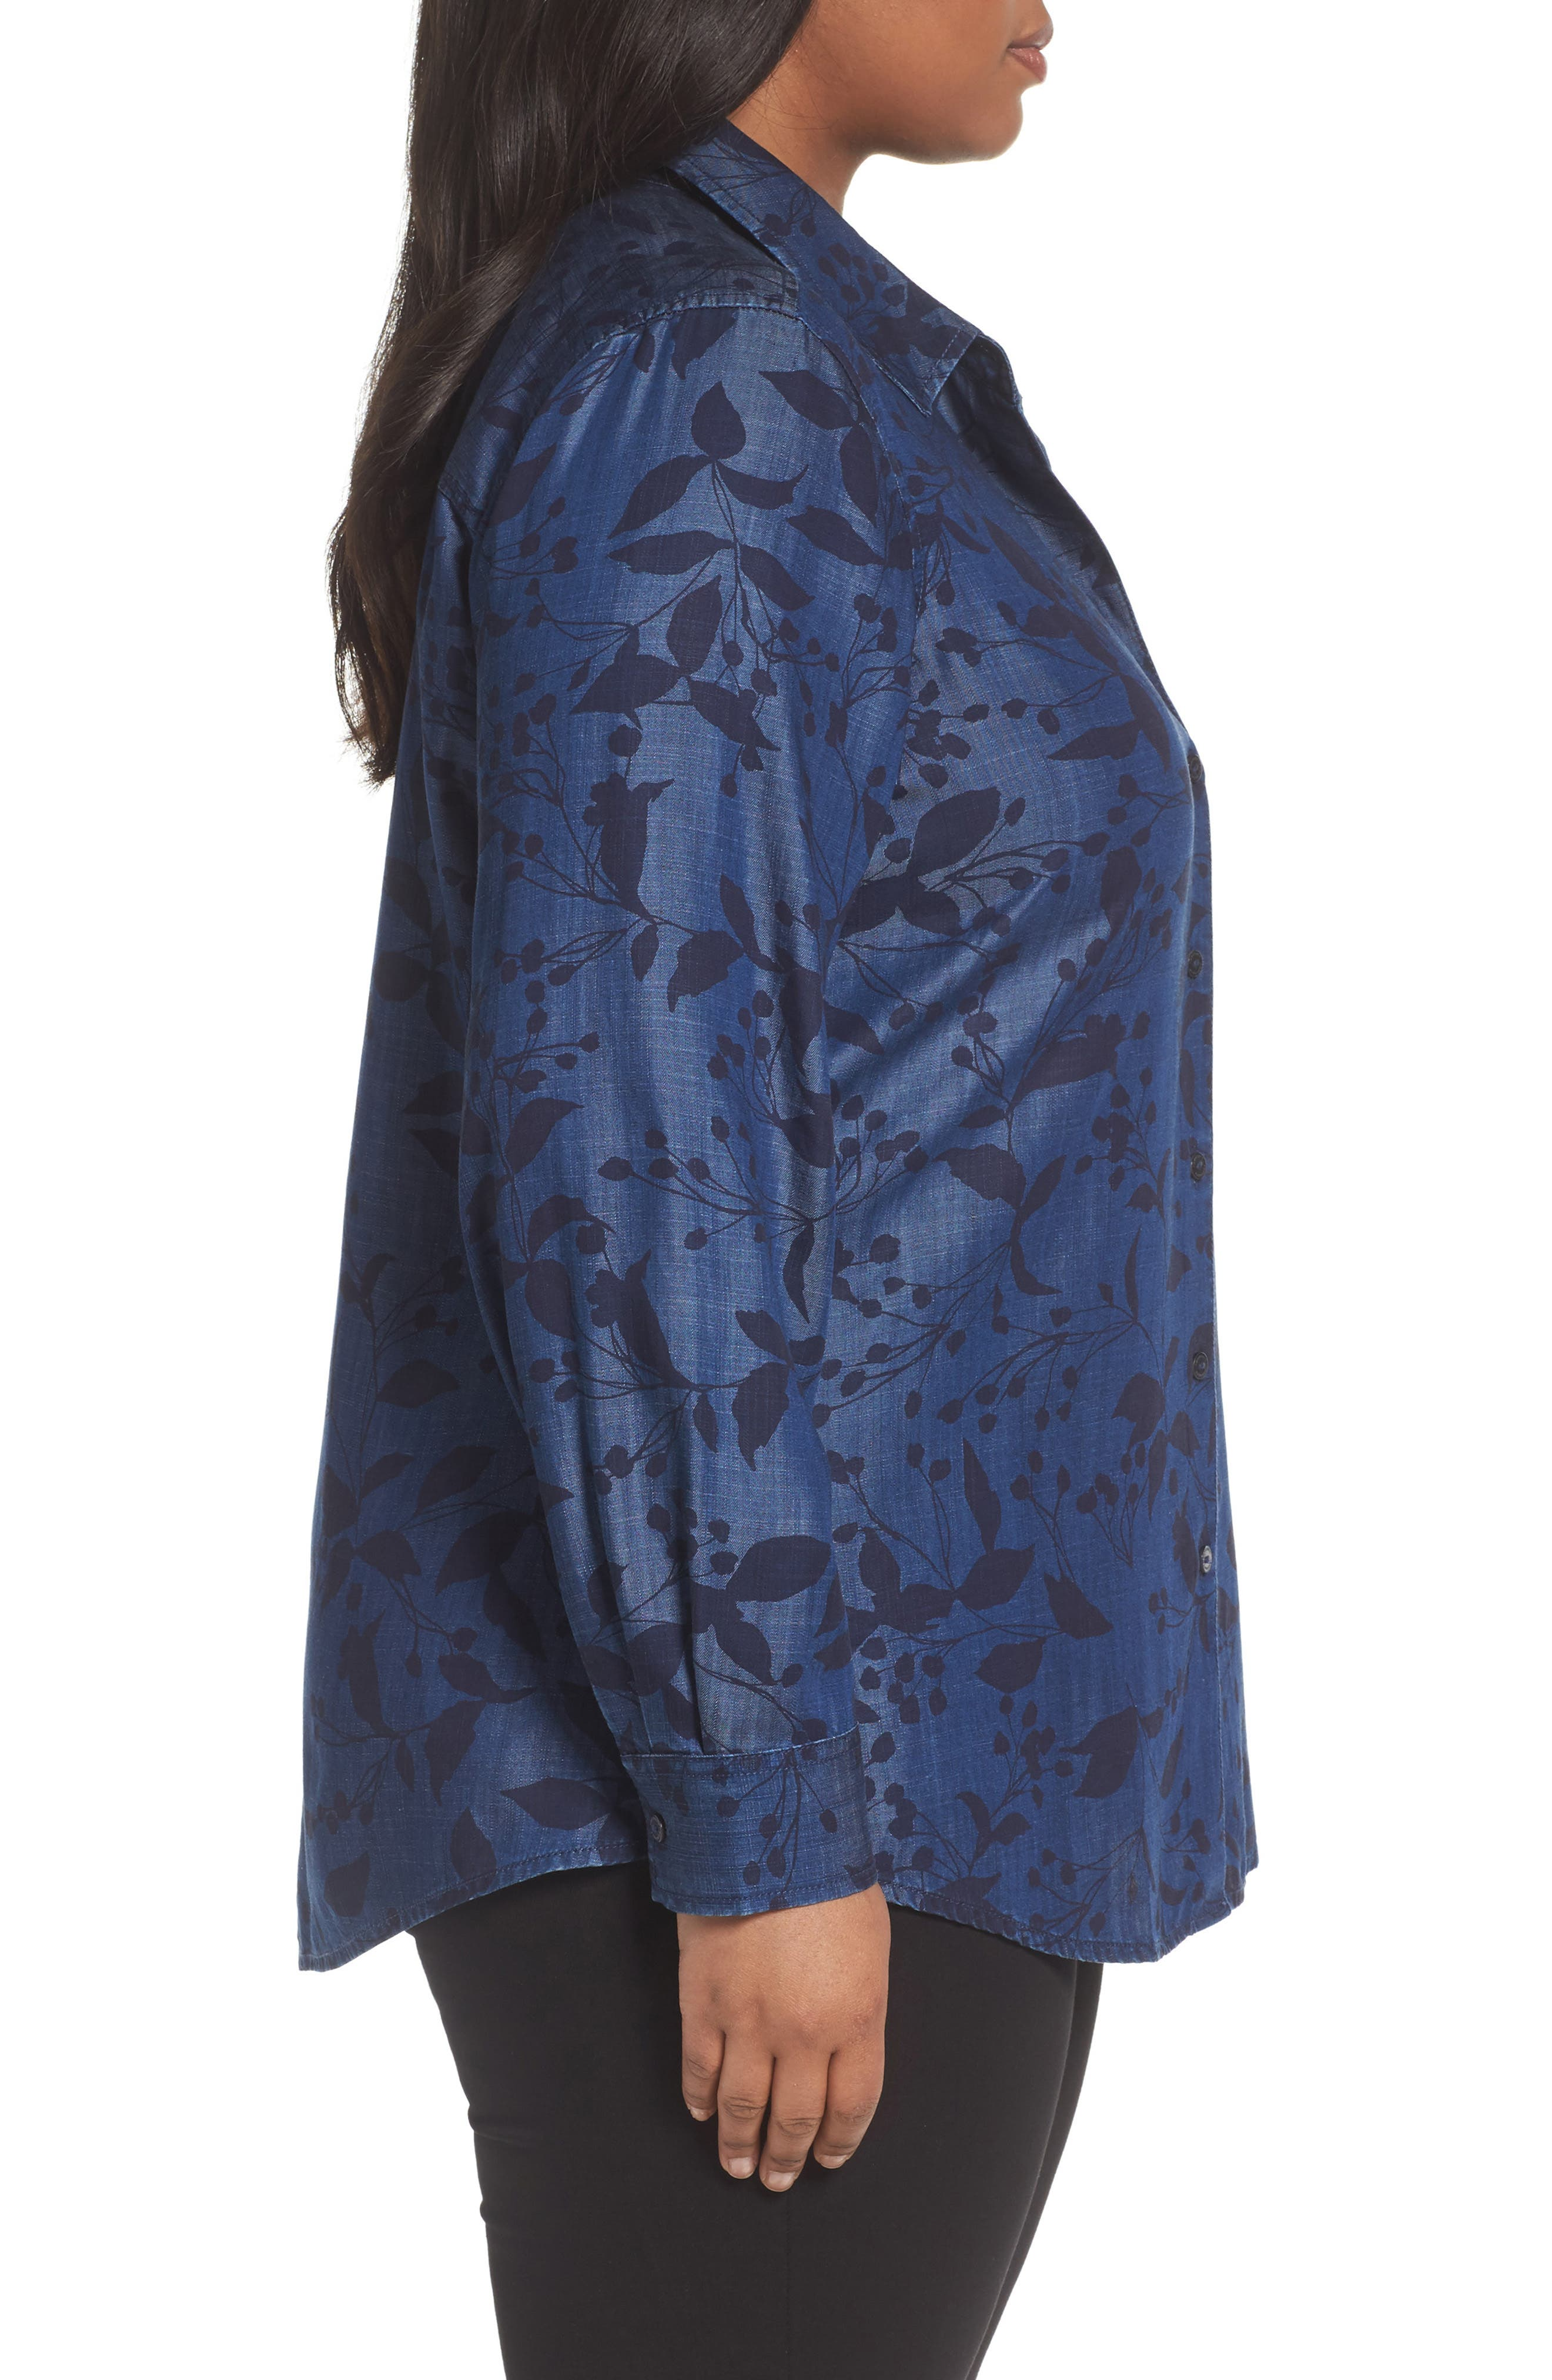 Alternate Image 3  - Foxcroft Addison Floral Print Tencel® Shirt (Plus Size)